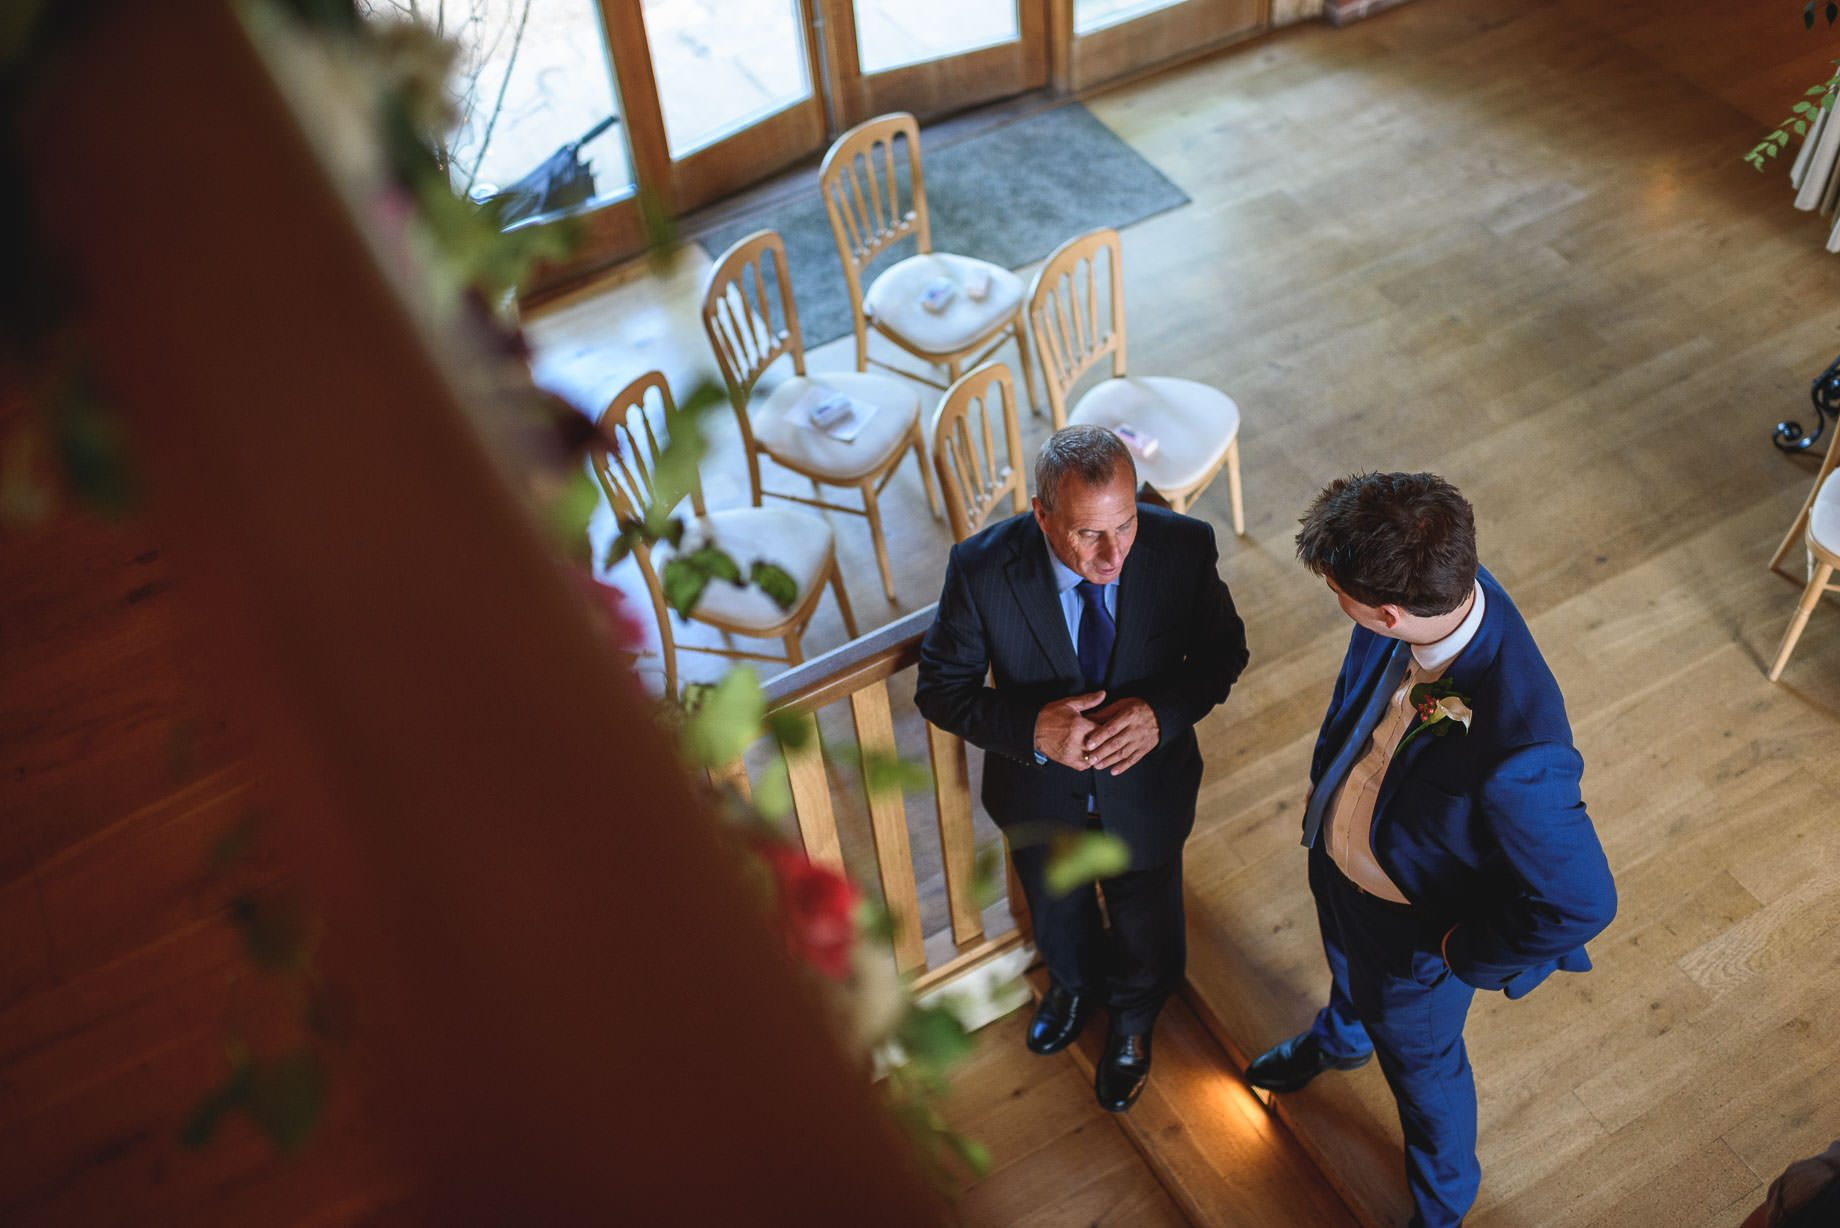 bury-court-barn-wedding-photography-guy-collier-photography-nadia-tom-27-of-184